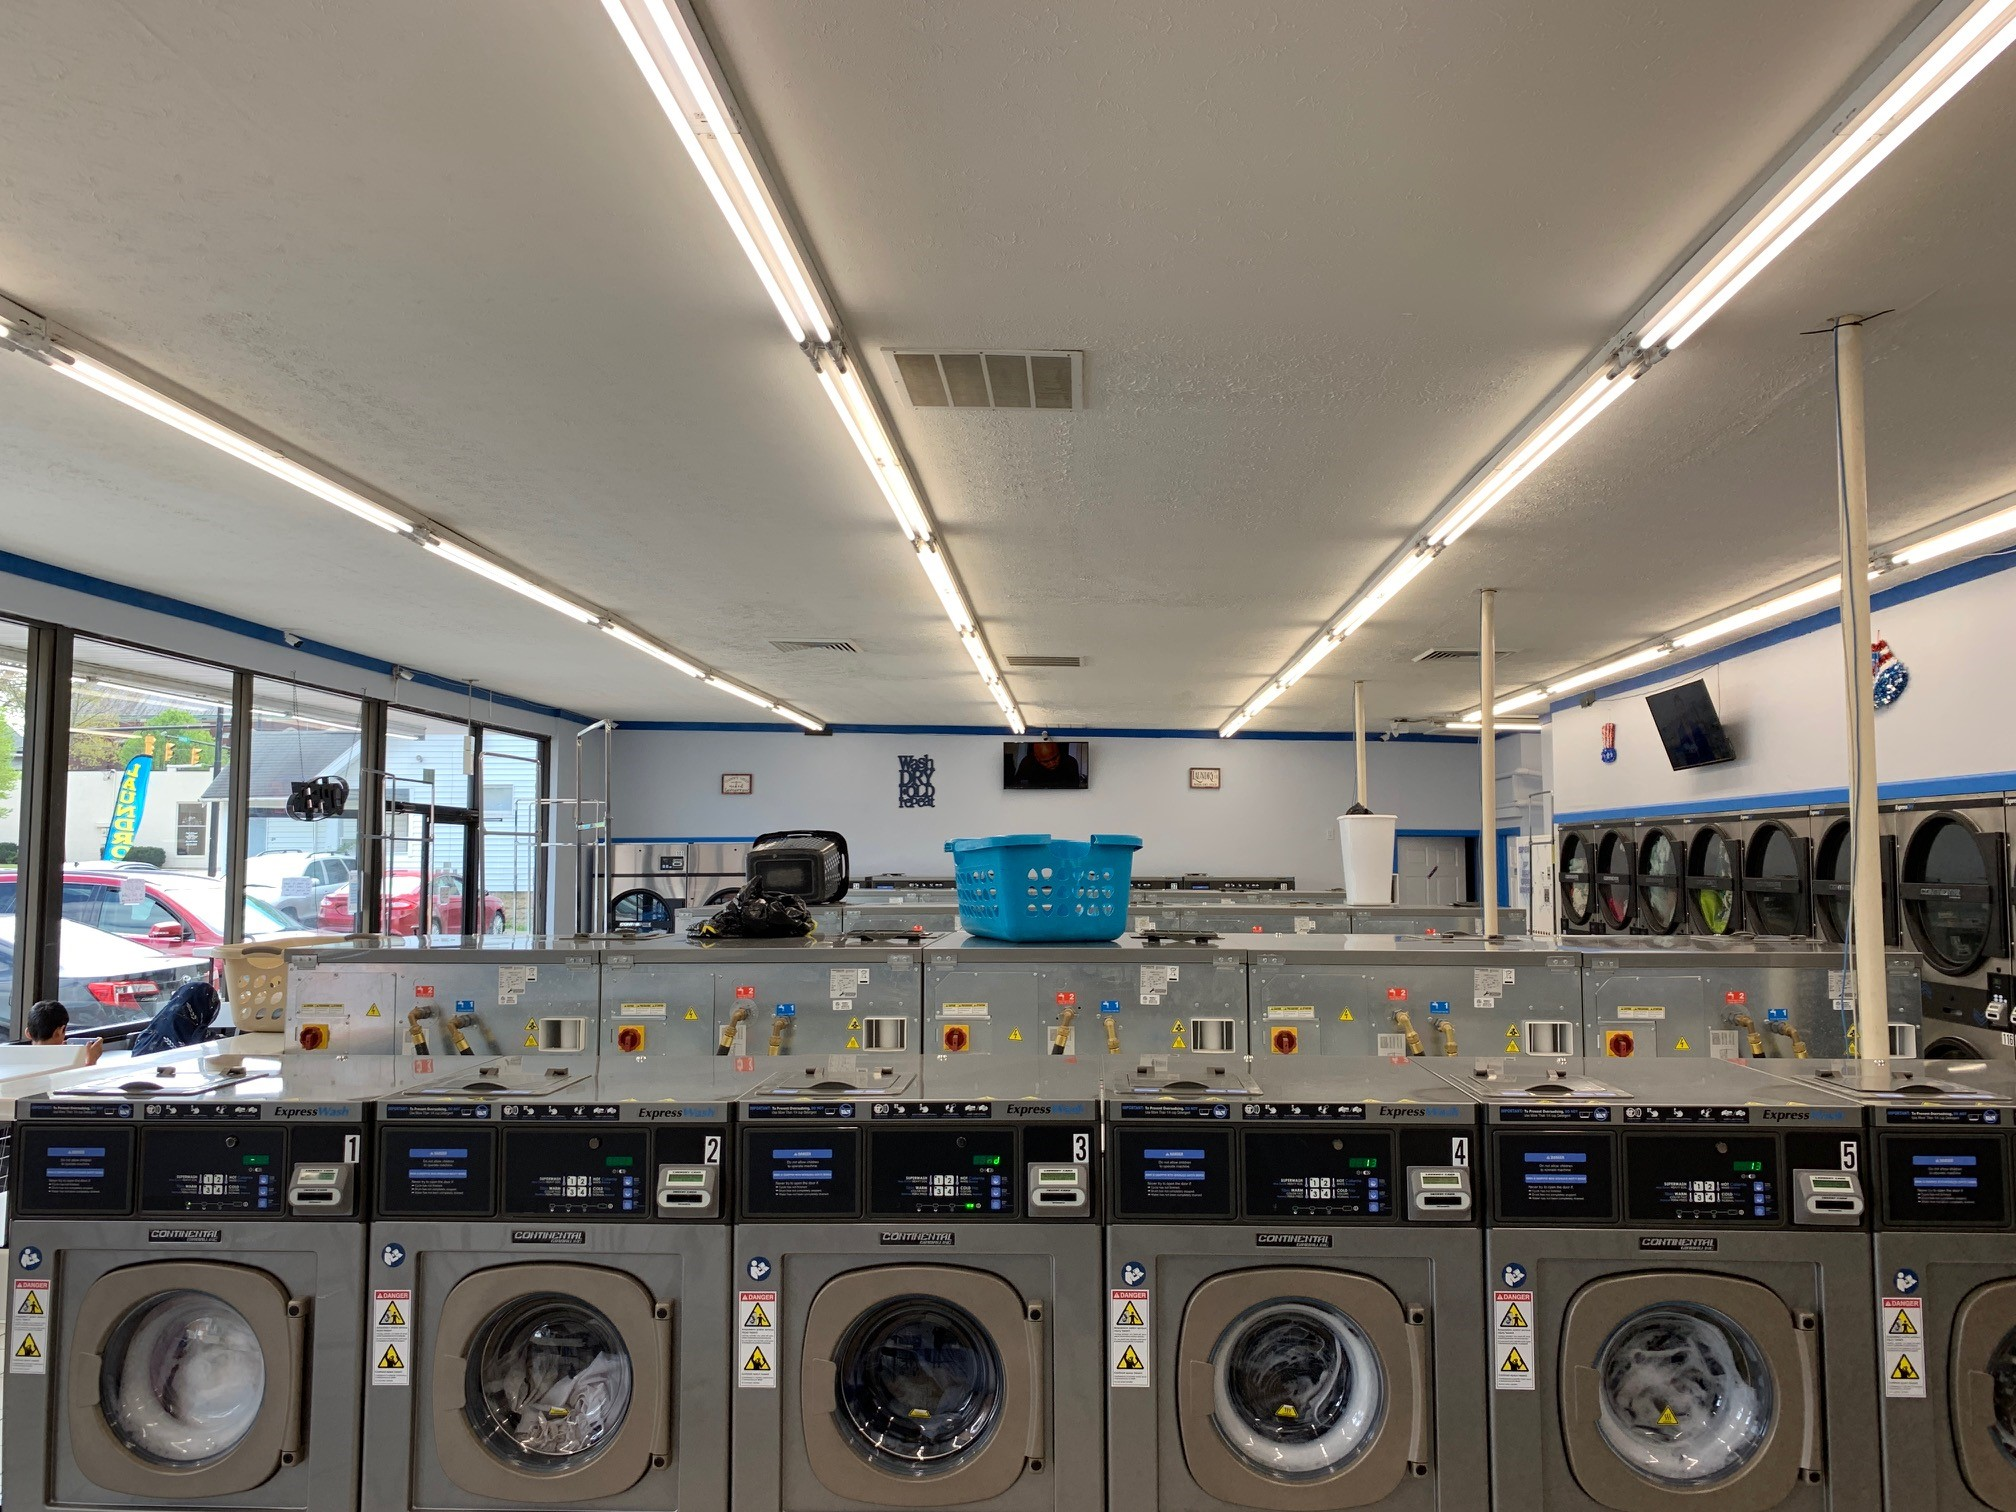 Akron main street laundromat washers